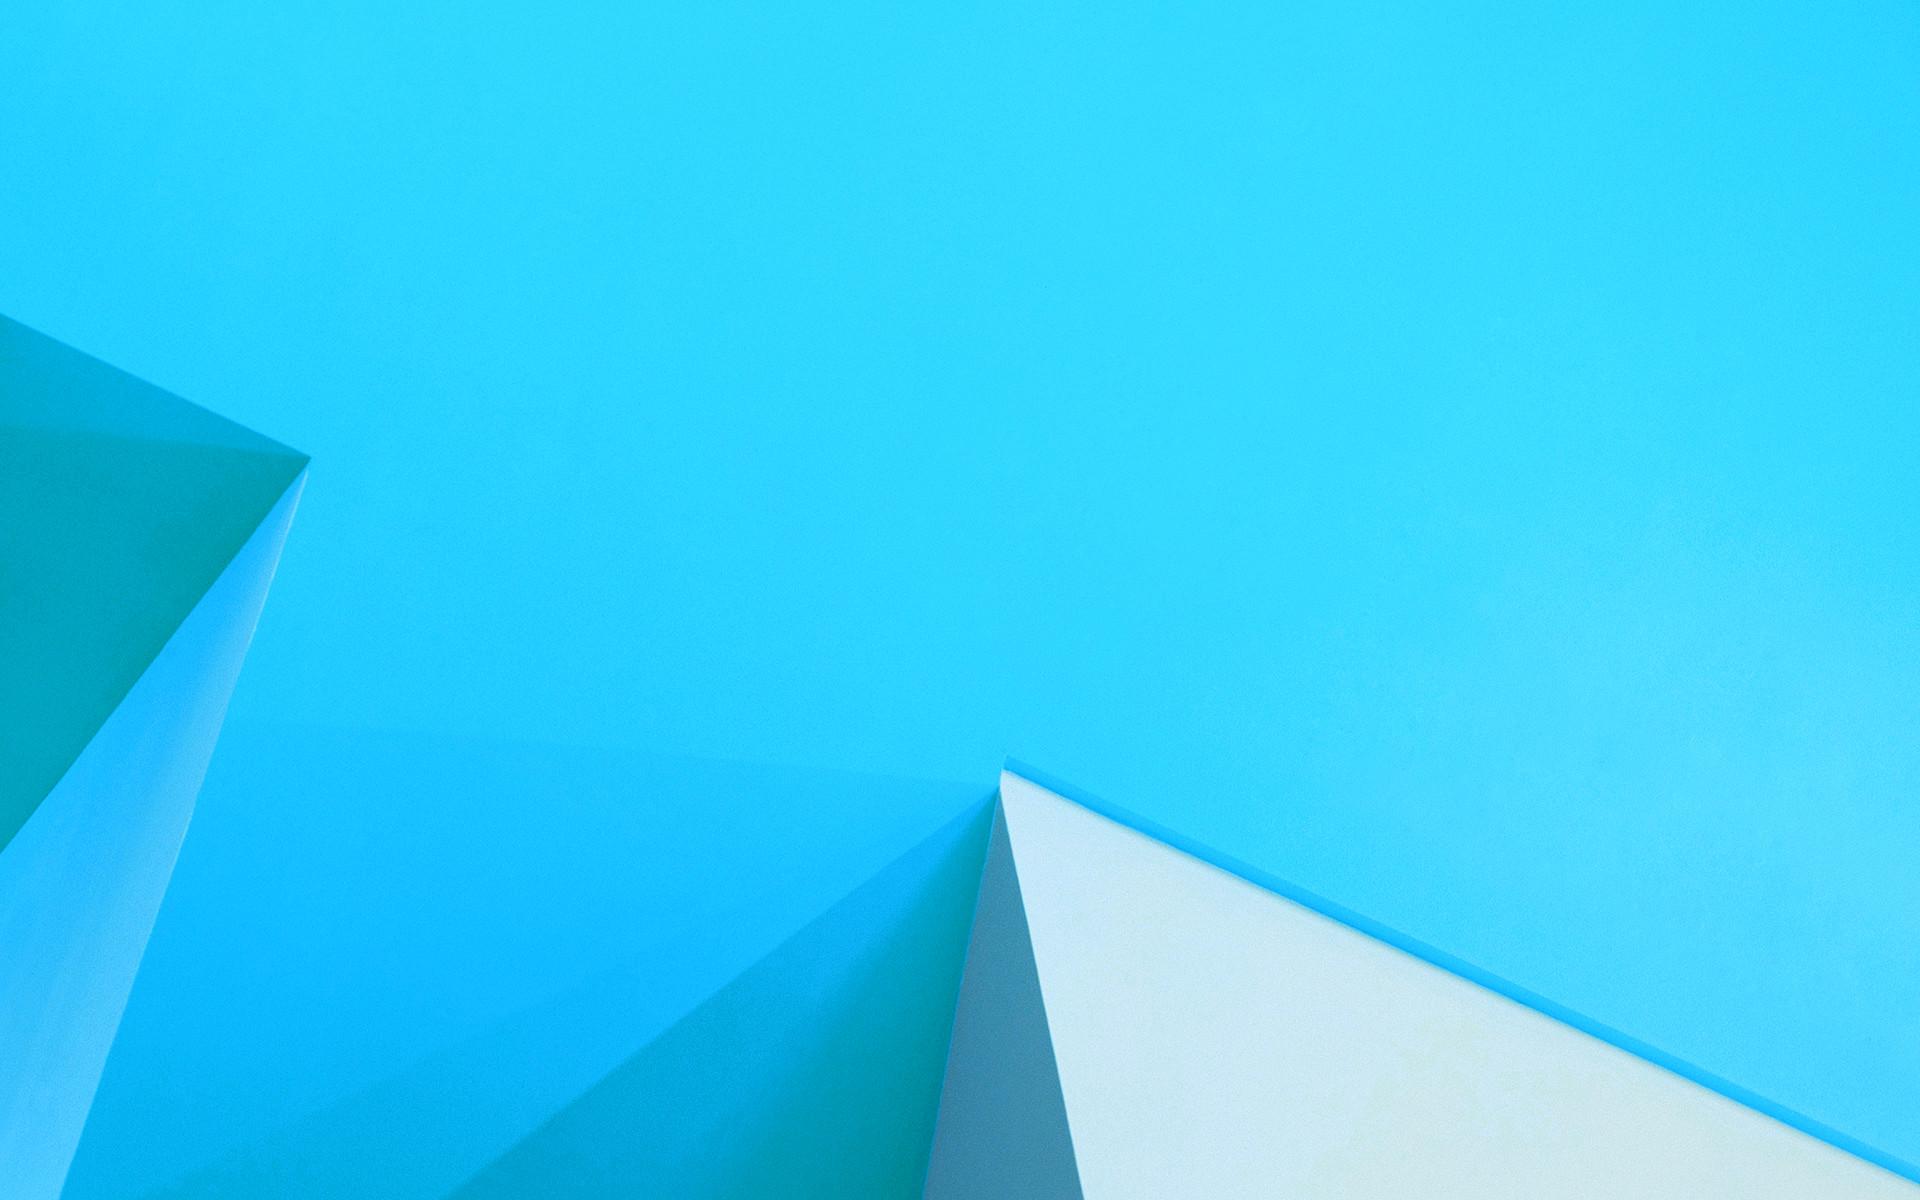 windows blue 8 1 by snowleopard64 on deviantart